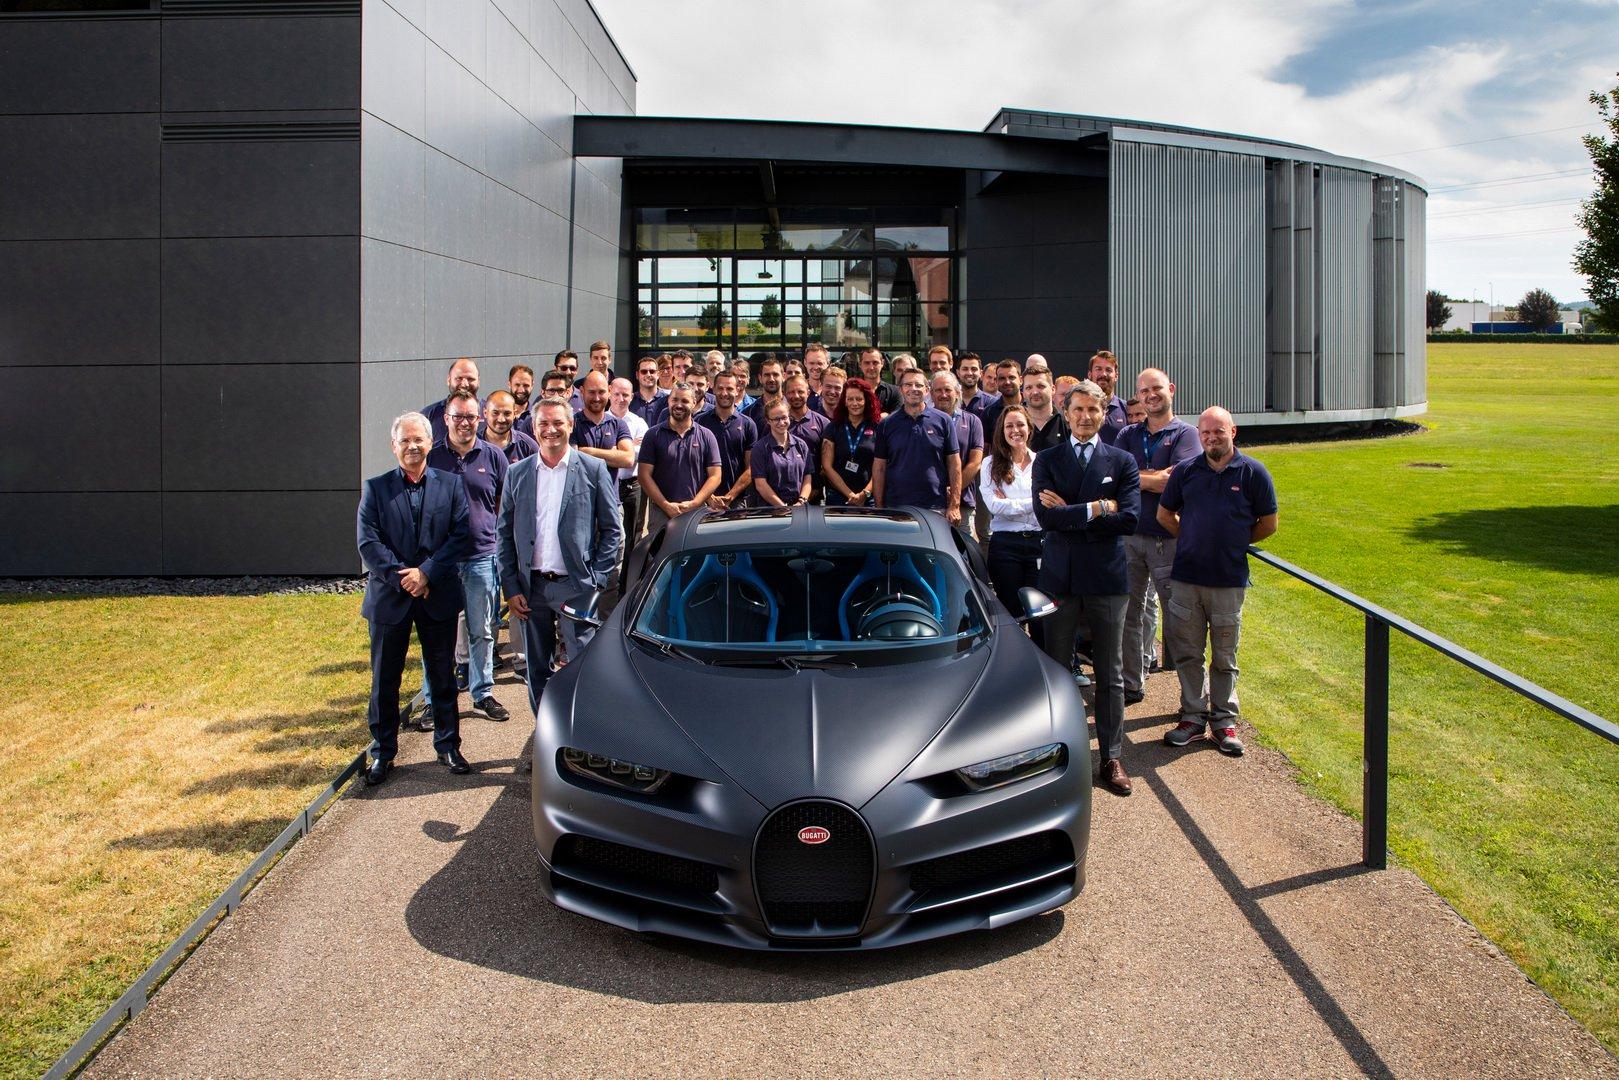 Bugatti Chiron chegou às 200 unidades produzidas